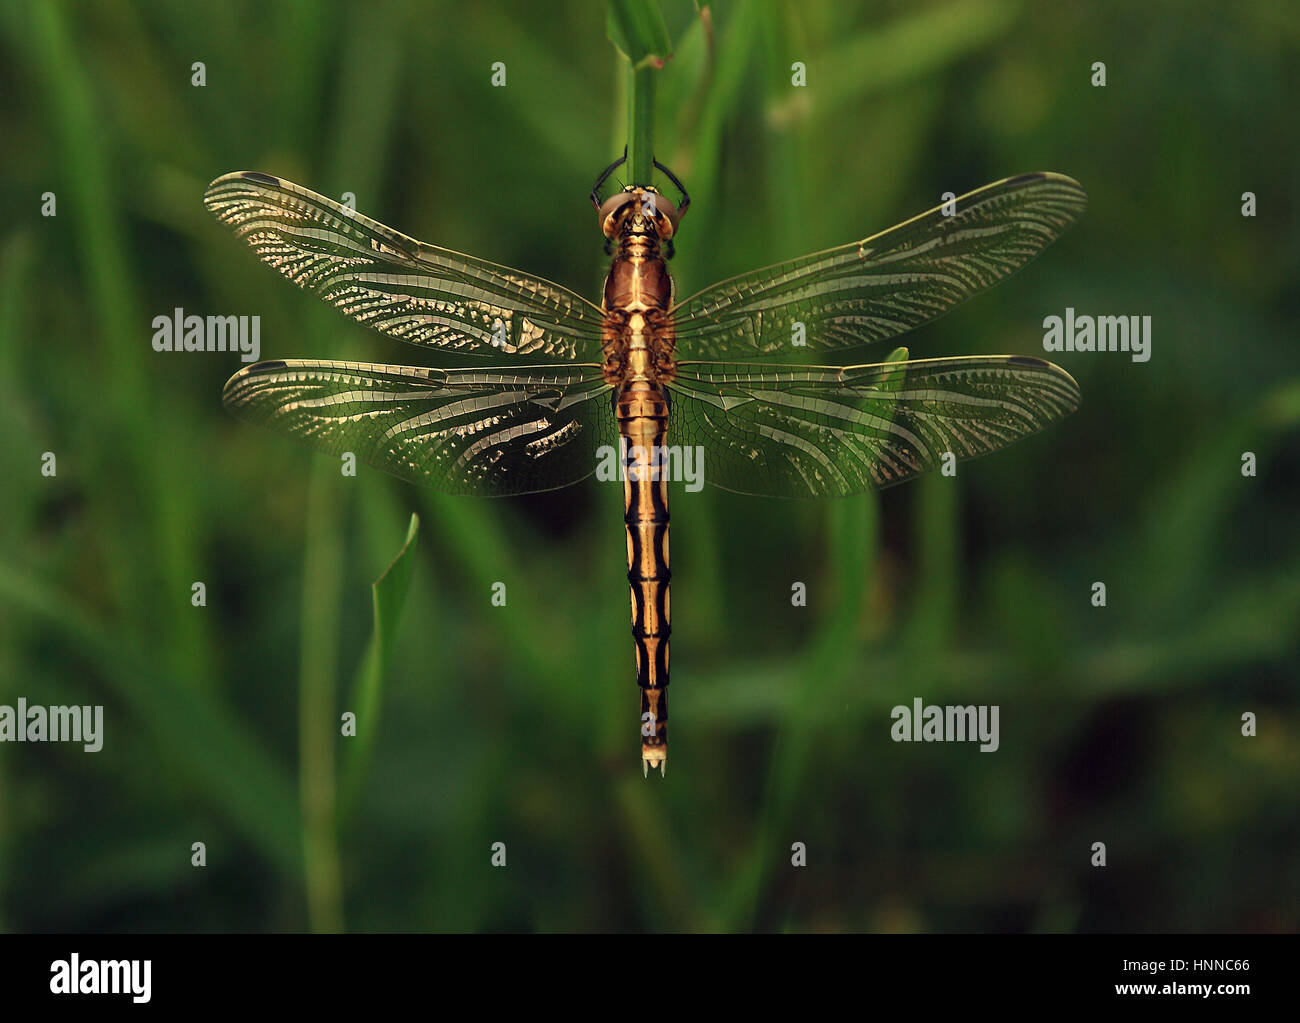 Dragonfly closeup - Stock Image